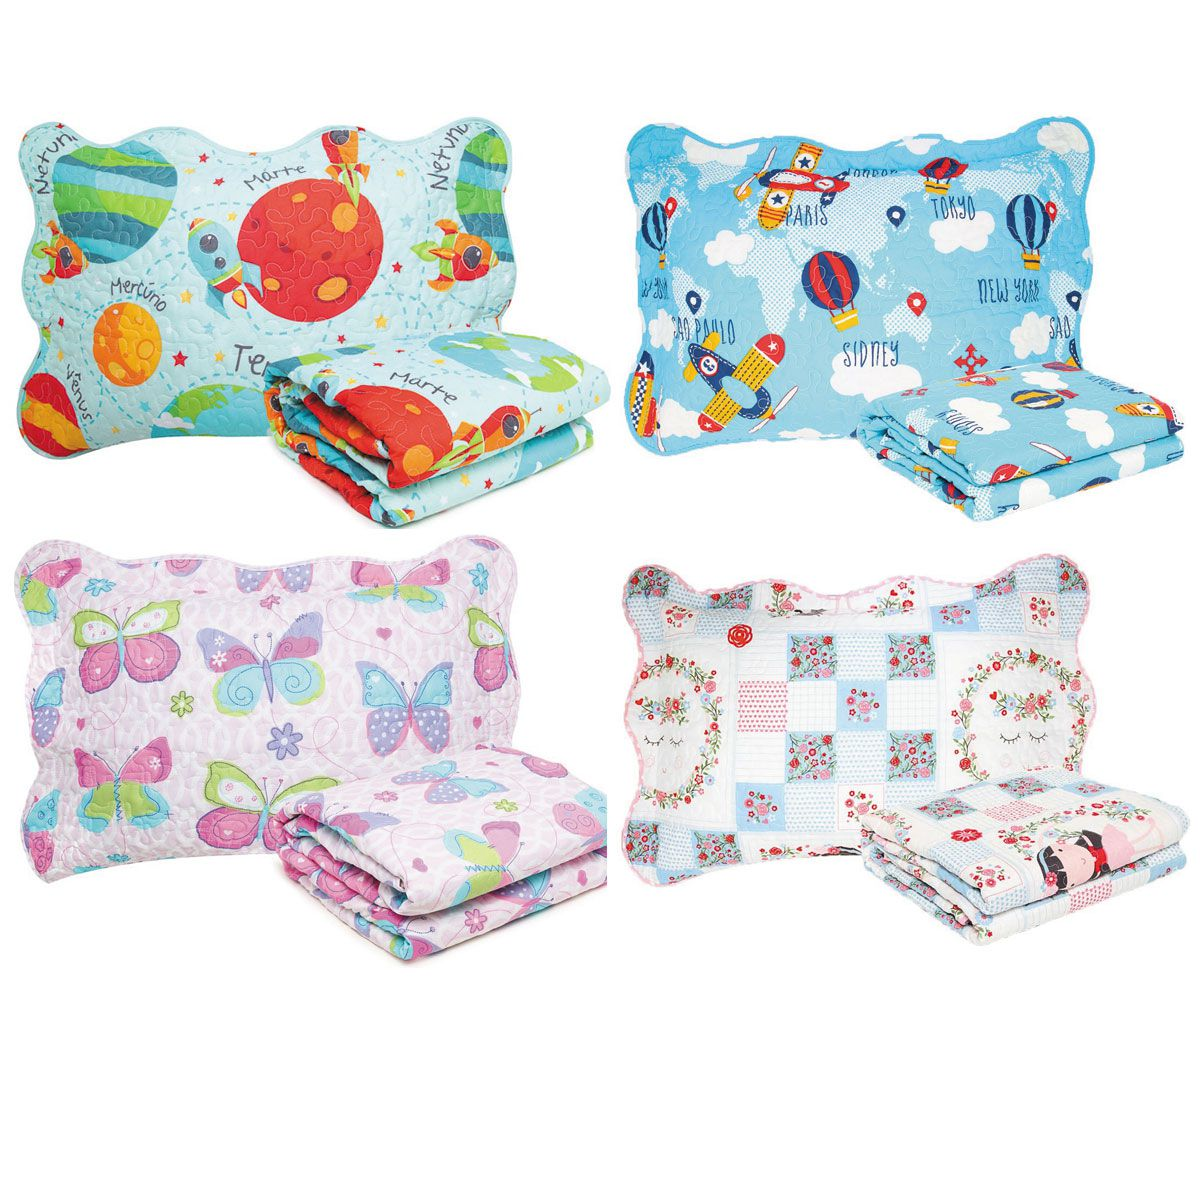 Colcha Boutis + Porta Travesseiro Infantil Menino E Menina Santista